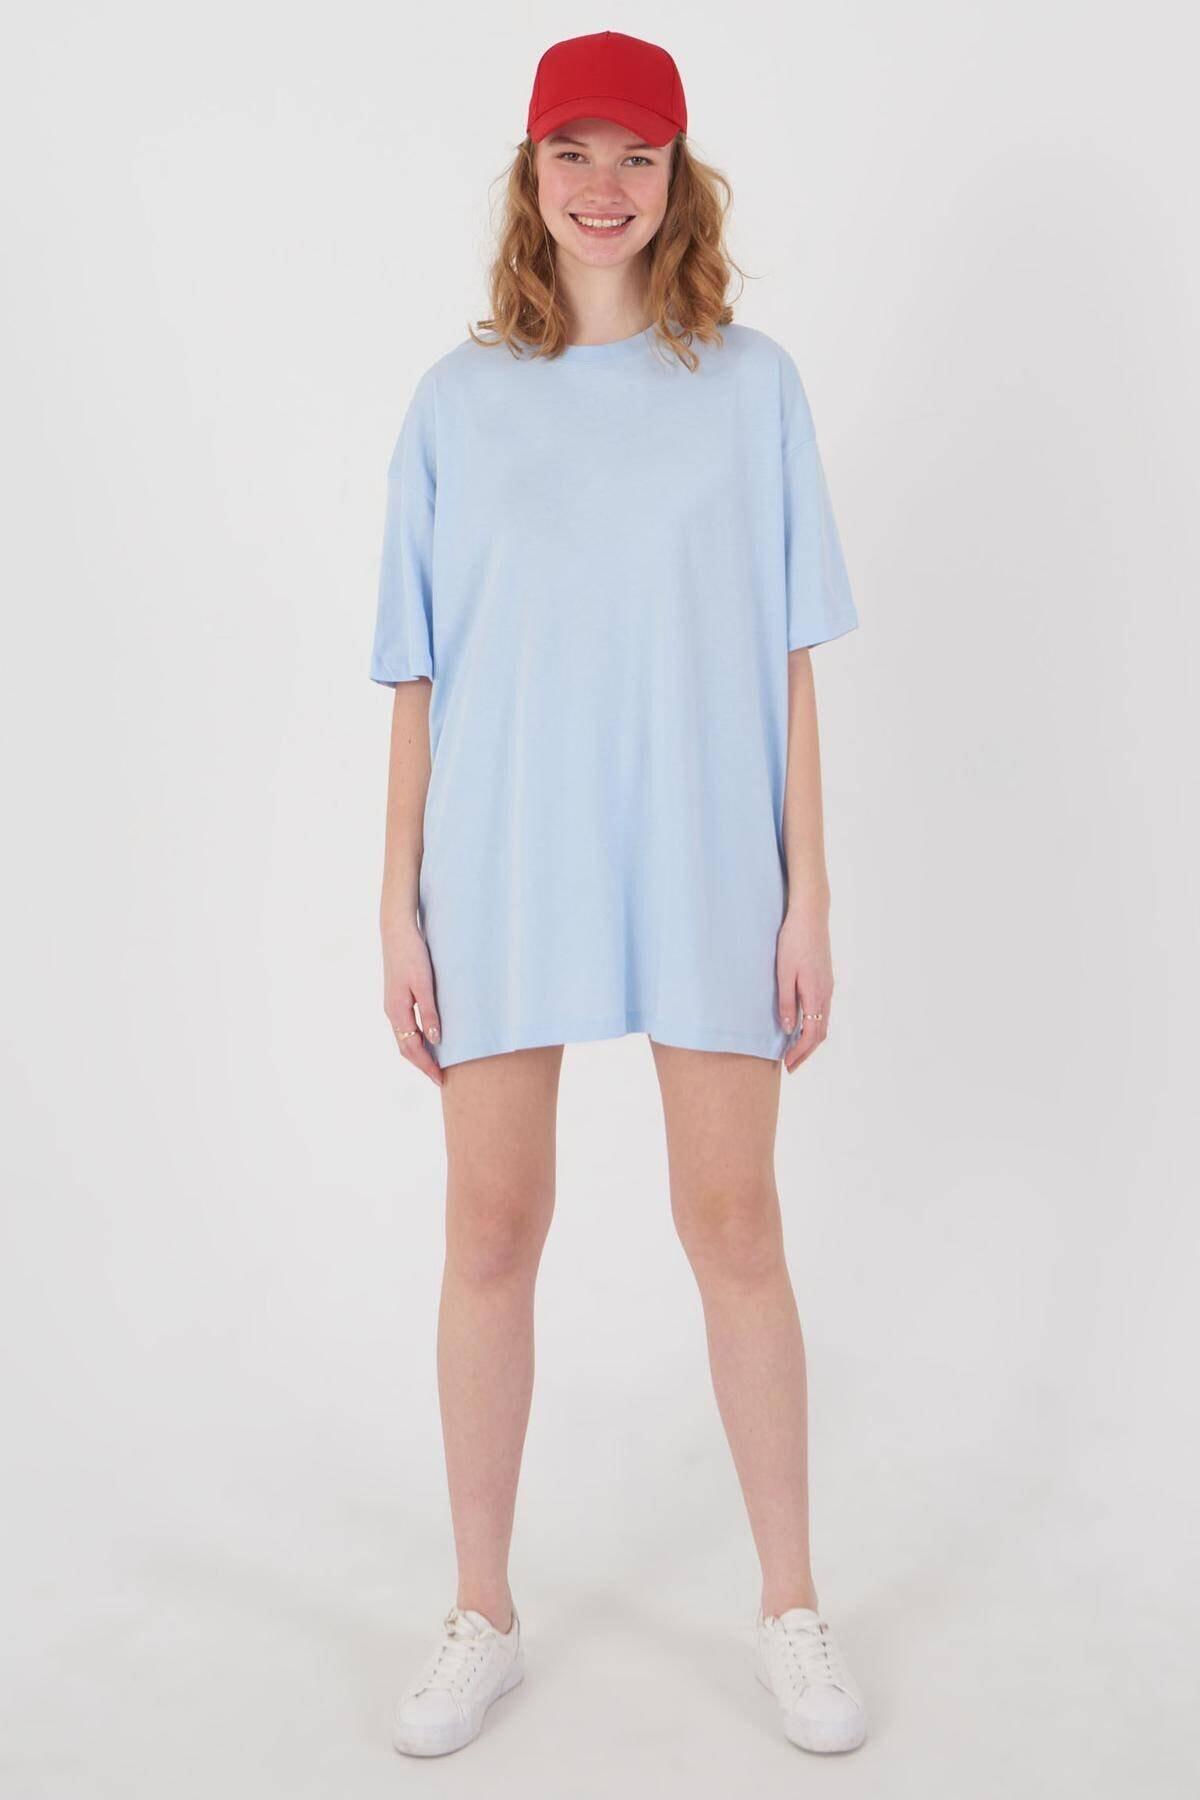 Addax Kadın Buz Mavi Oversize T-Shirt P0731 - G6K7 Adx-0000020596 1